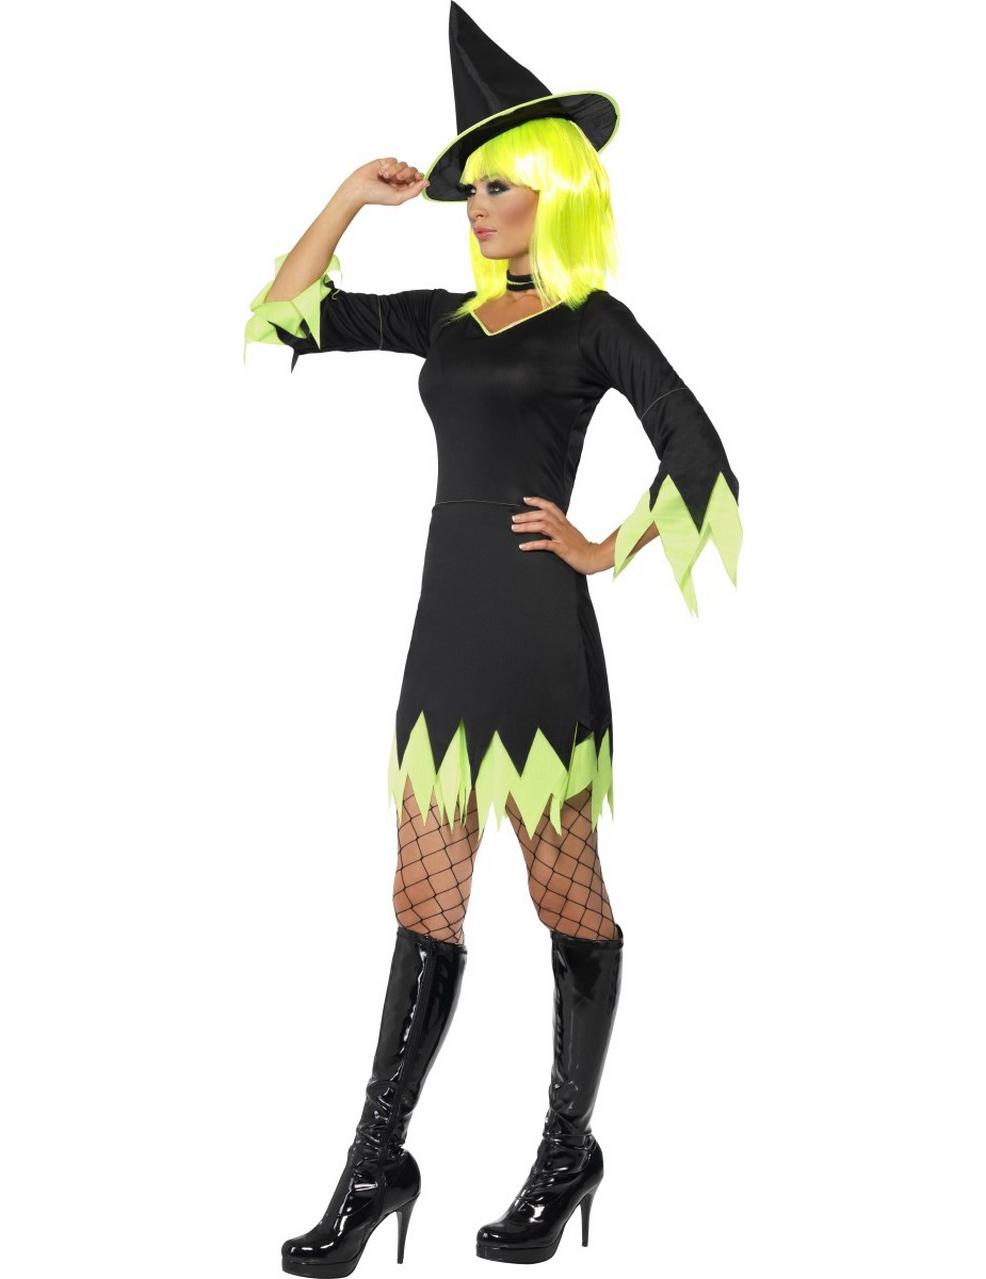 halloween hexen kost m schwarz gelb f r damen kost me f r. Black Bedroom Furniture Sets. Home Design Ideas